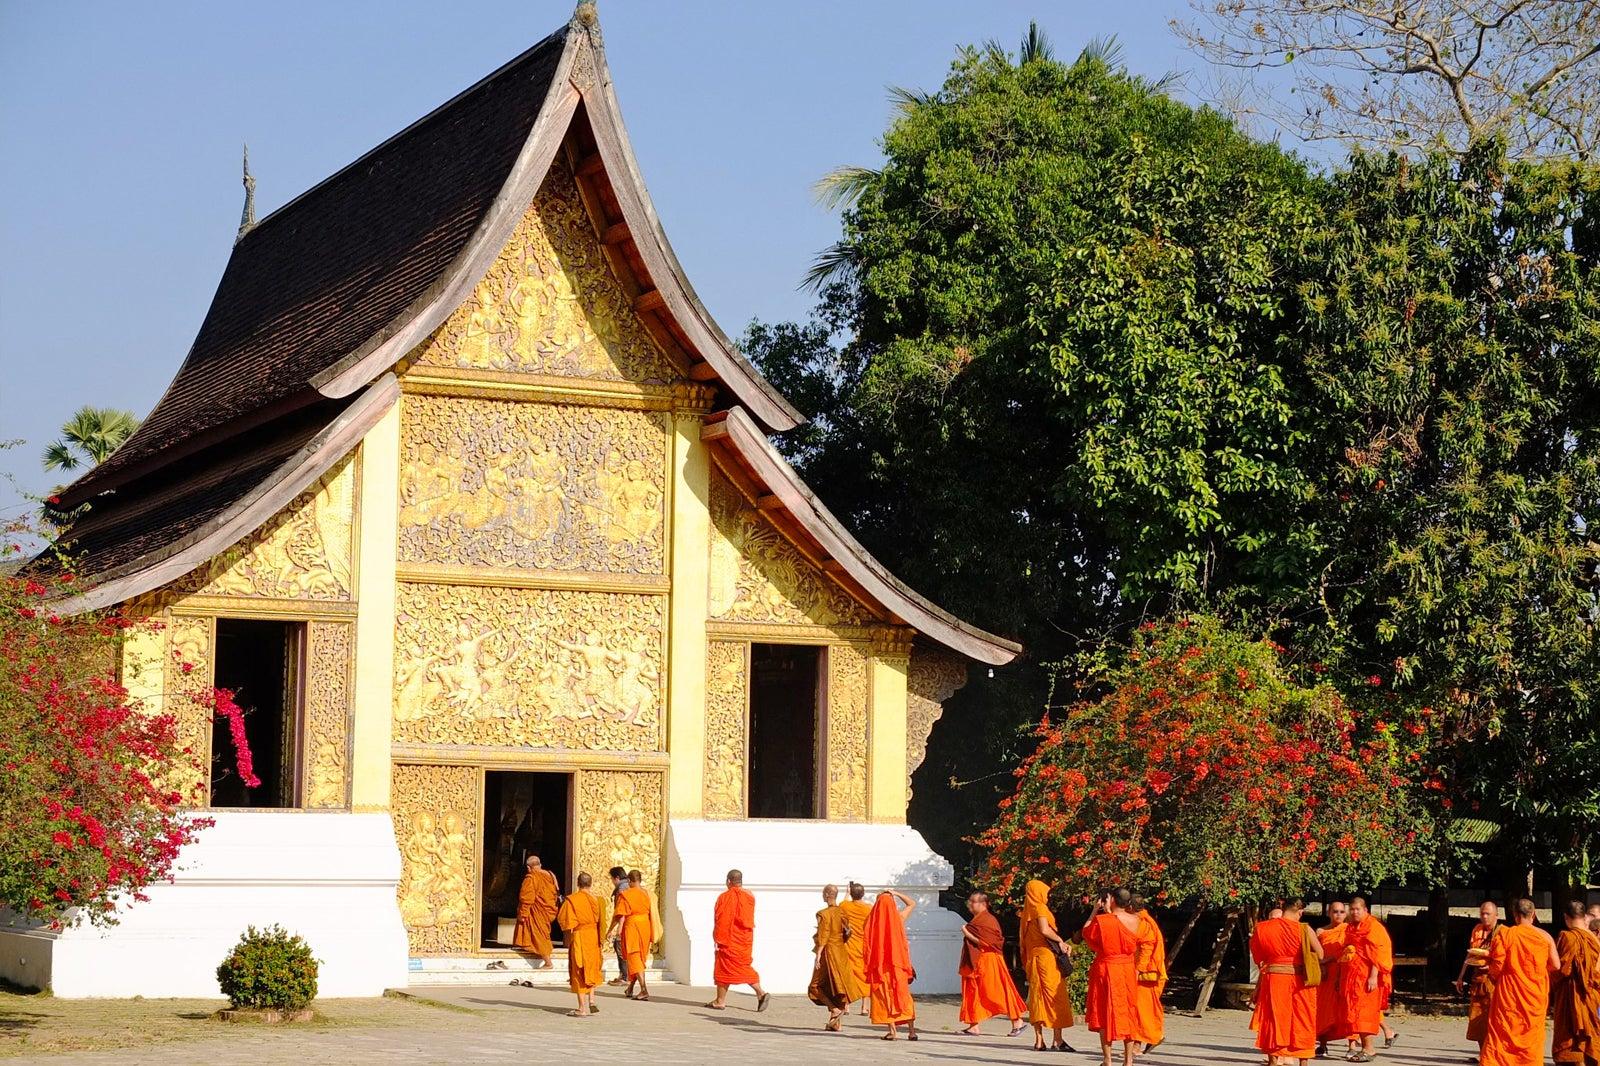 Wat Xieng Thong in Laos - 16th-century Buddhist Temple in Luang Prabang